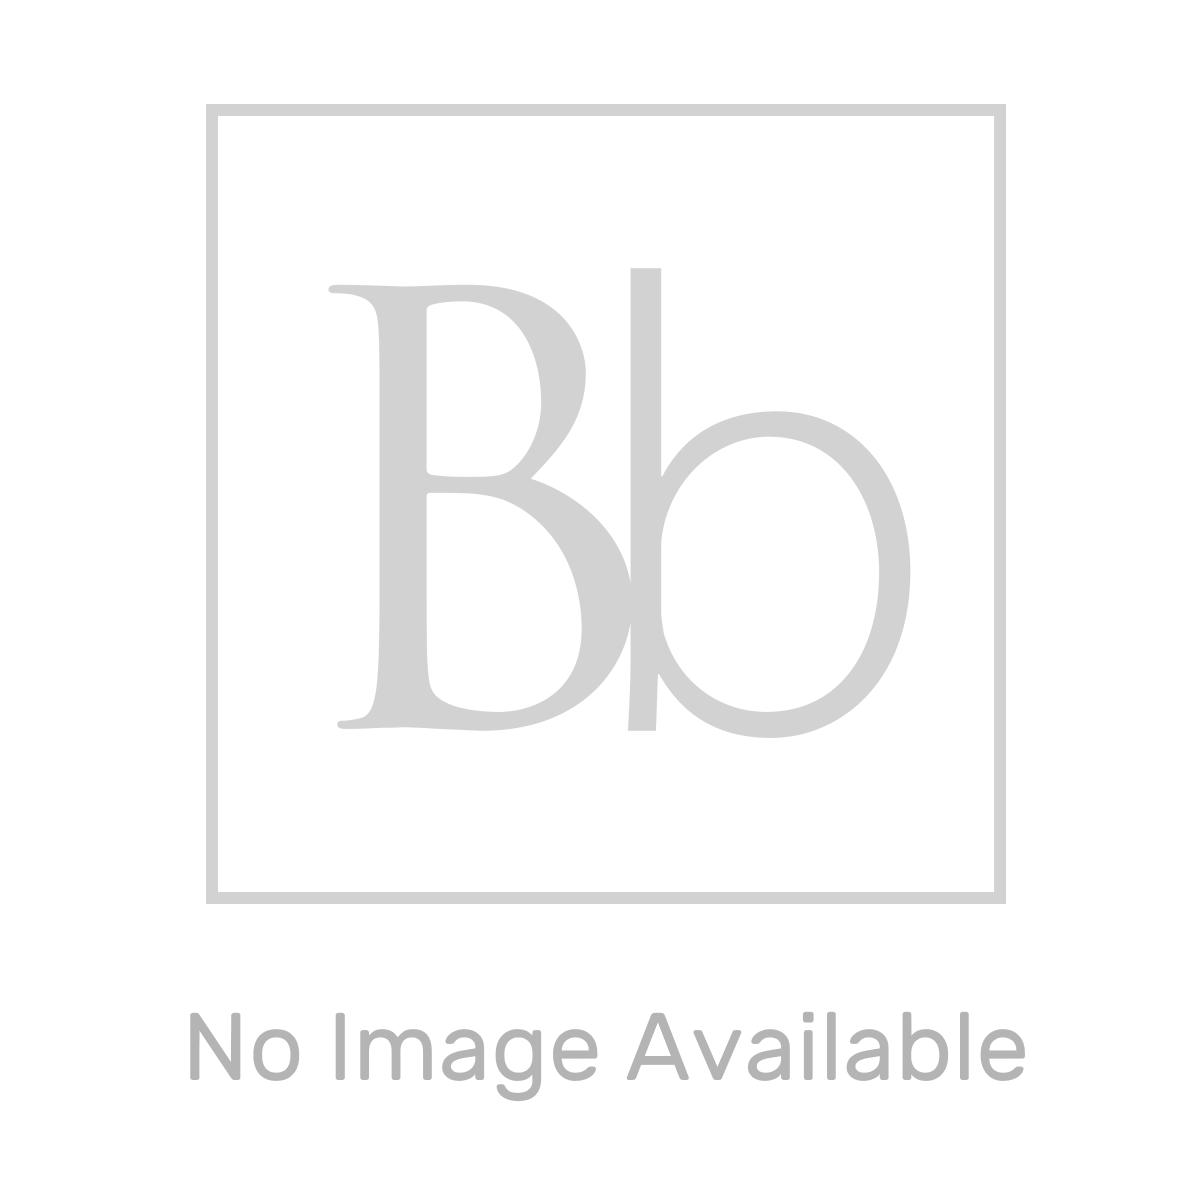 RAK Moon Black Ceramic Soap Dispenser